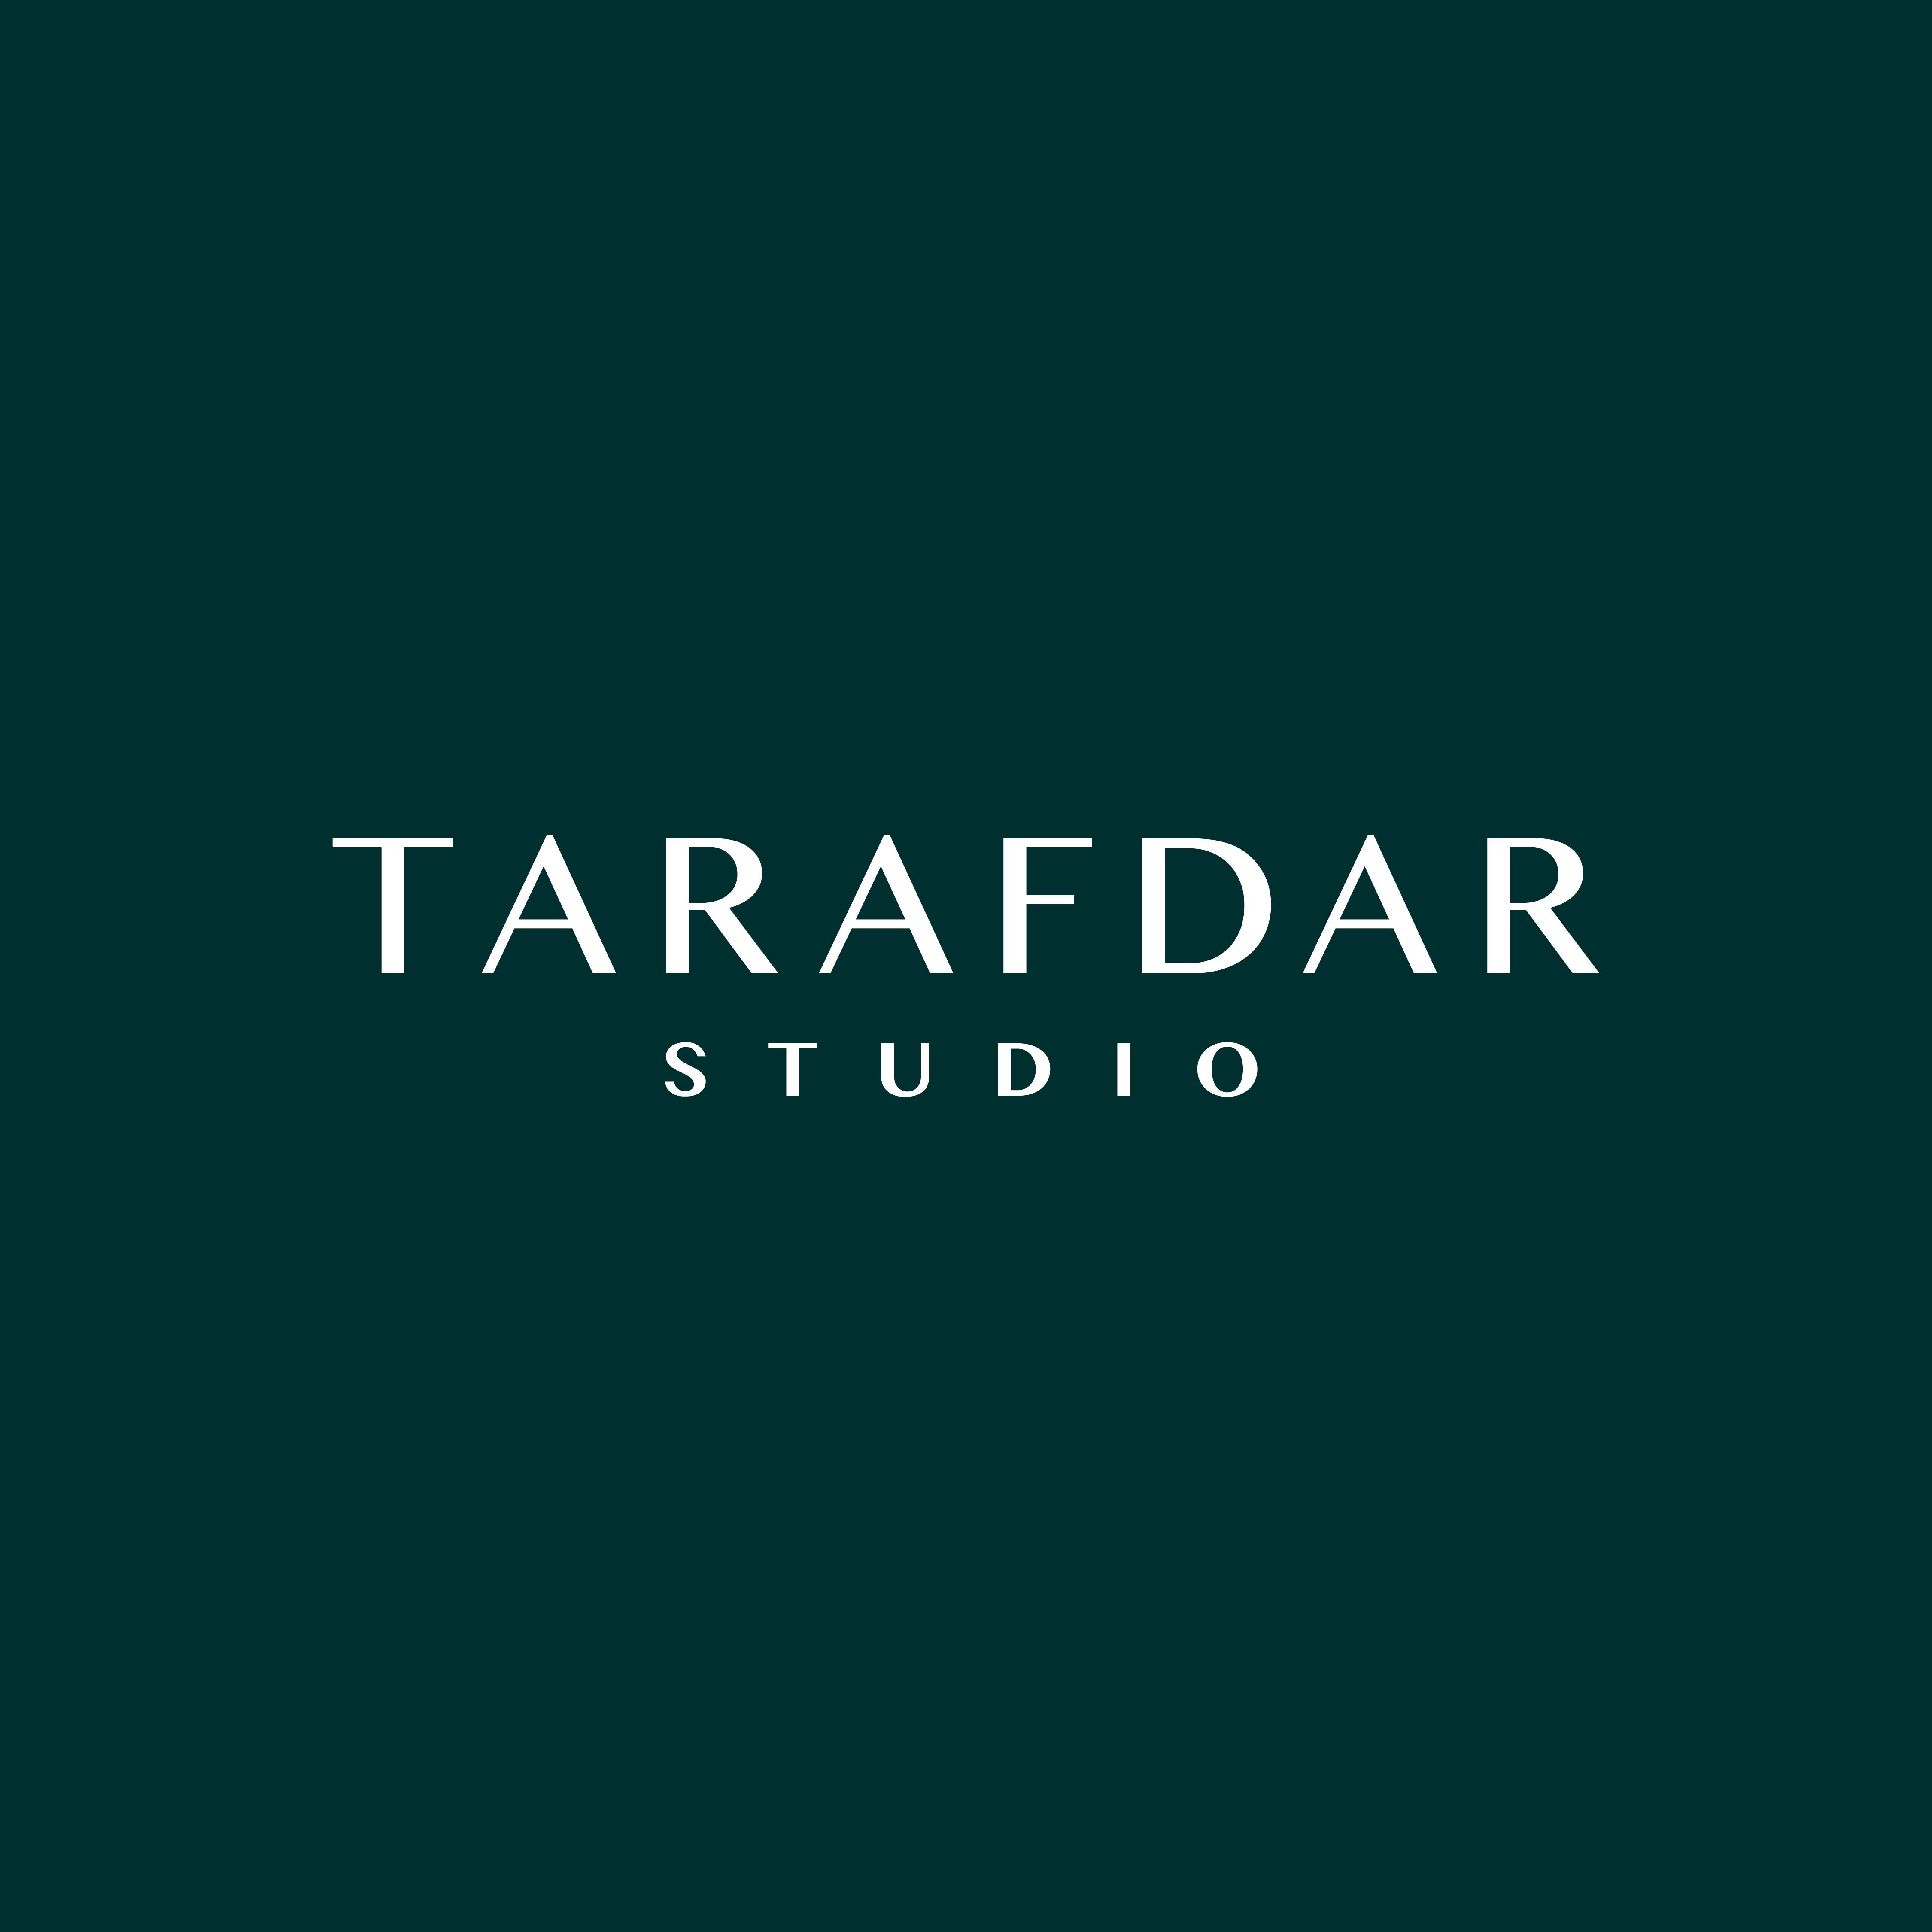 Tarafdar Studio Logo